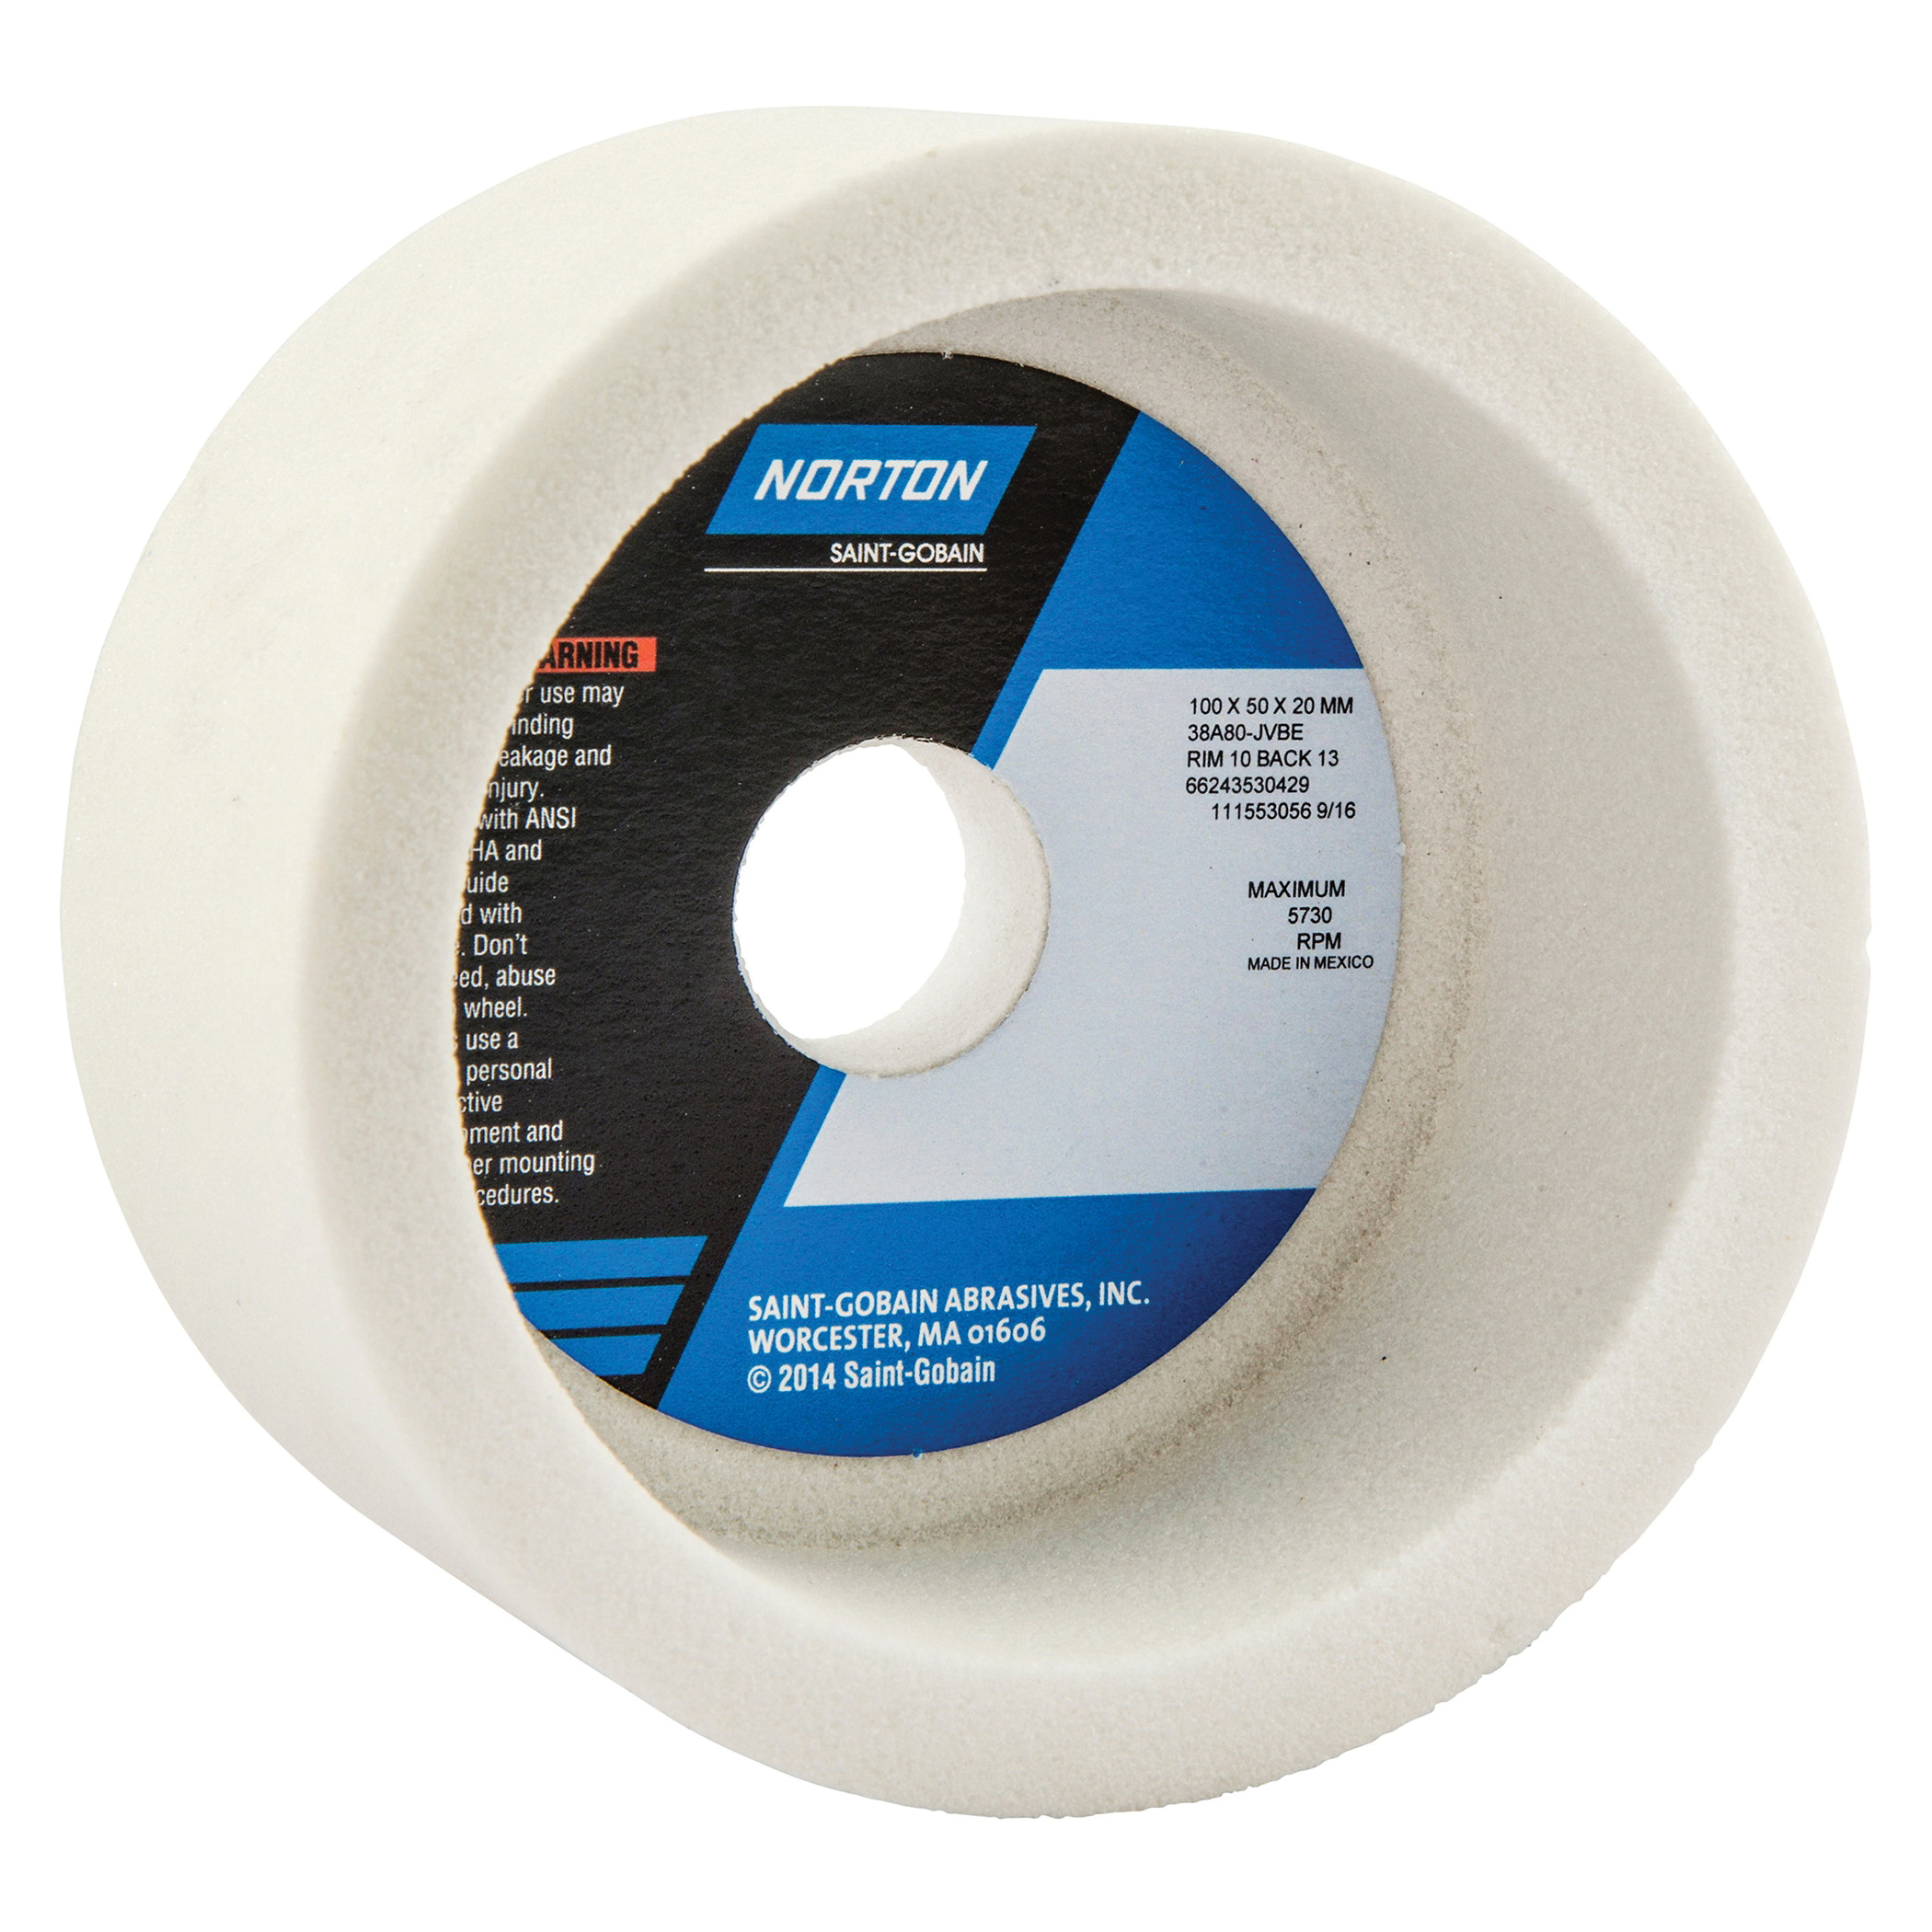 Norton® 66243530429 38A Toolroom Wheel, 100 mm Dia x 50 mm THK, 20 mm Center Hole, 80 Grit, Aluminum Oxide Abrasive